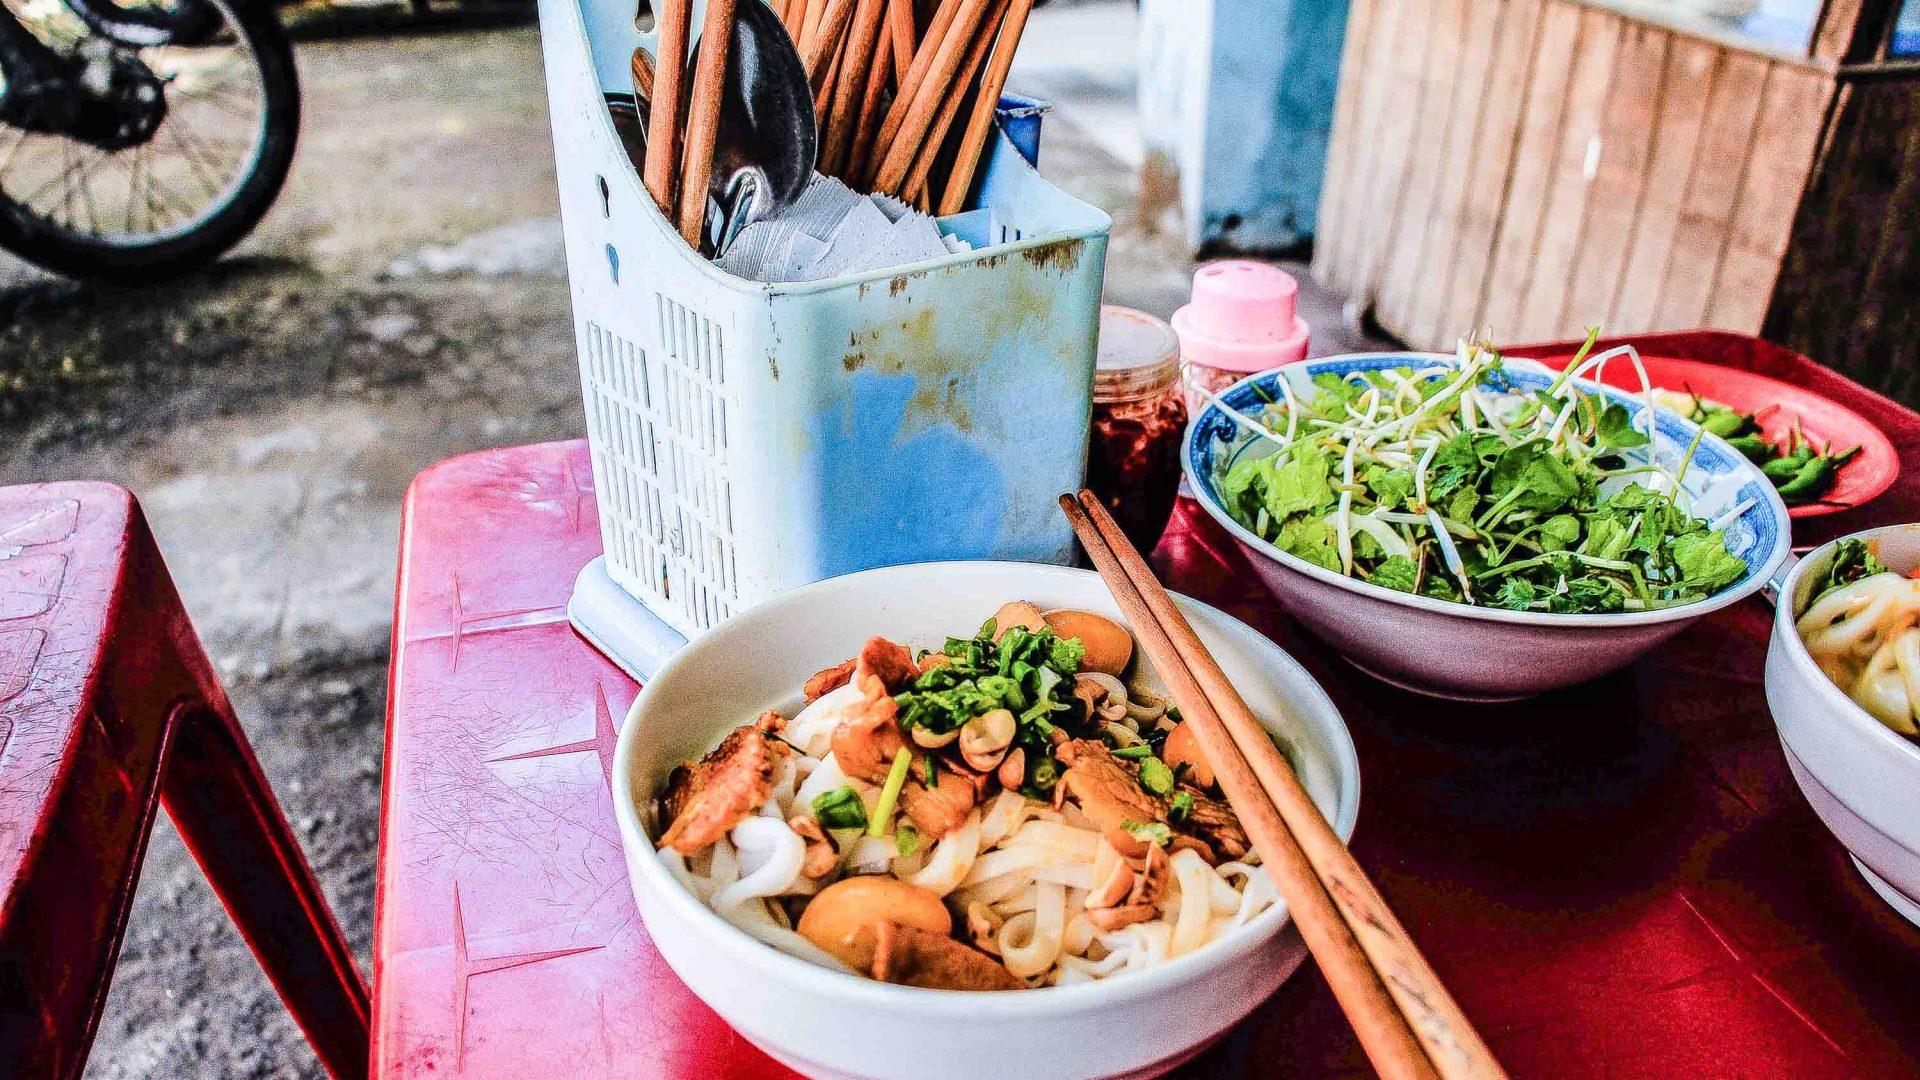 Vietnamese street food in Da Nang, Vietnam.